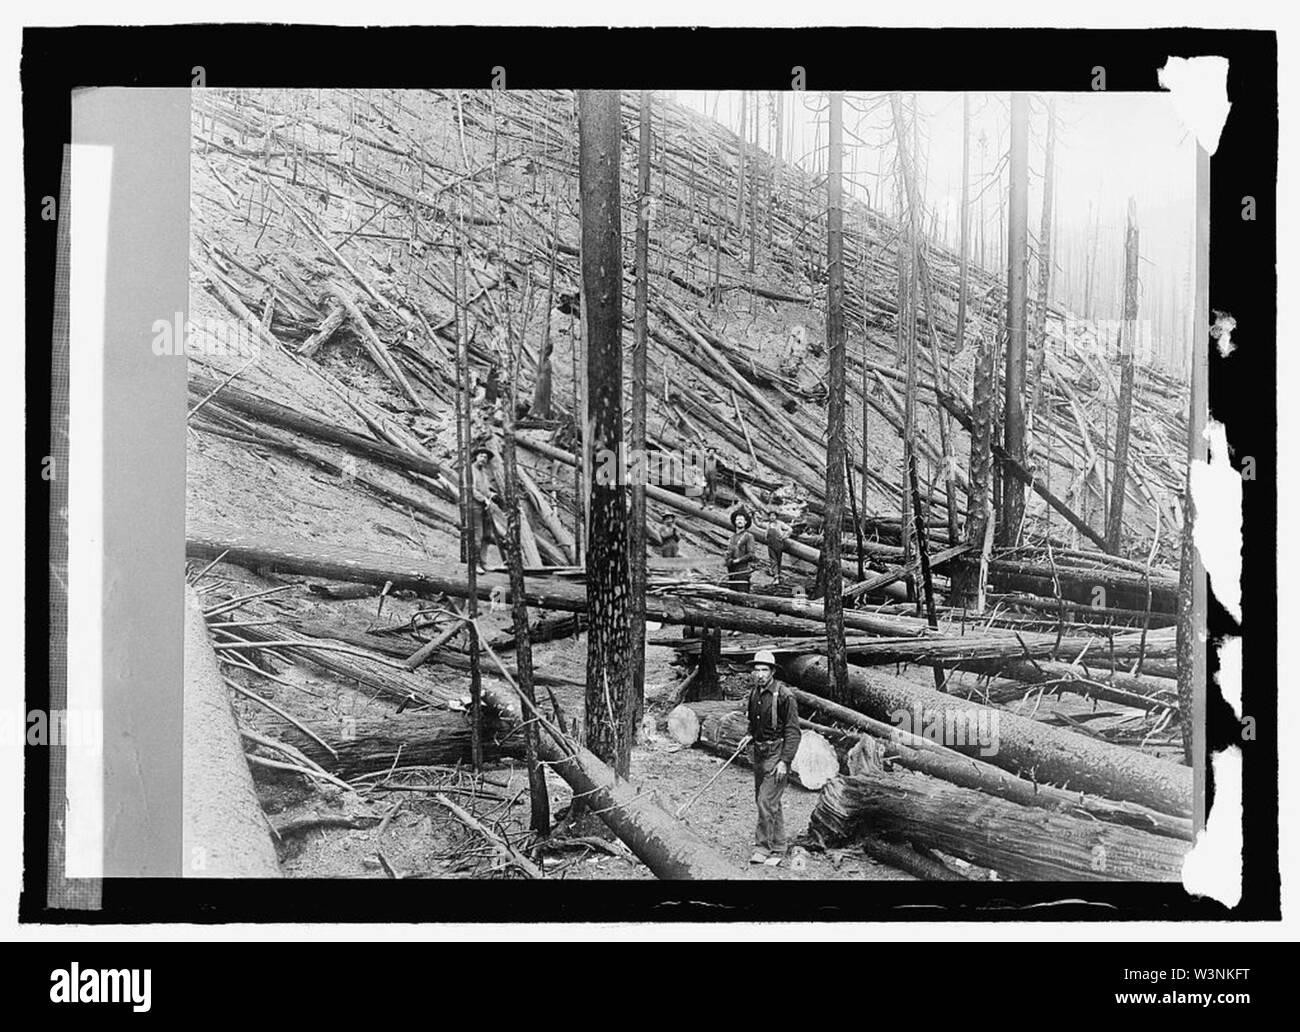 Coeur d'Alene Nat. Forest, Idaho - Stock Image